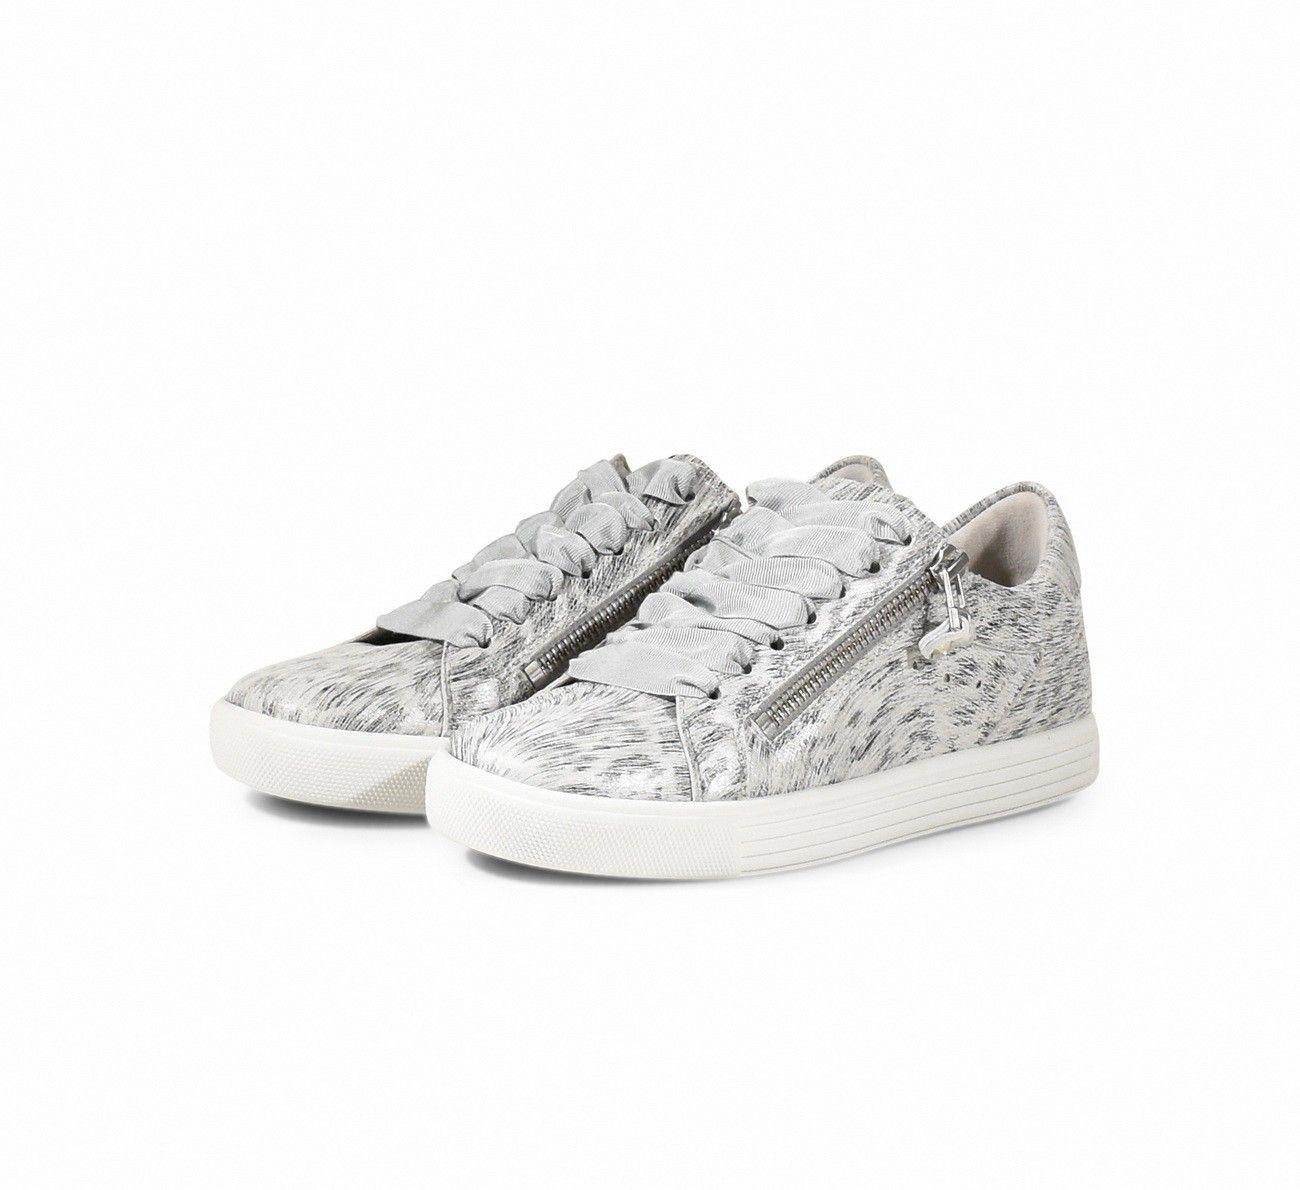 KENNEL & SCHMENGER - Damen Sneaker - Town Iron Leo - Light/Silve